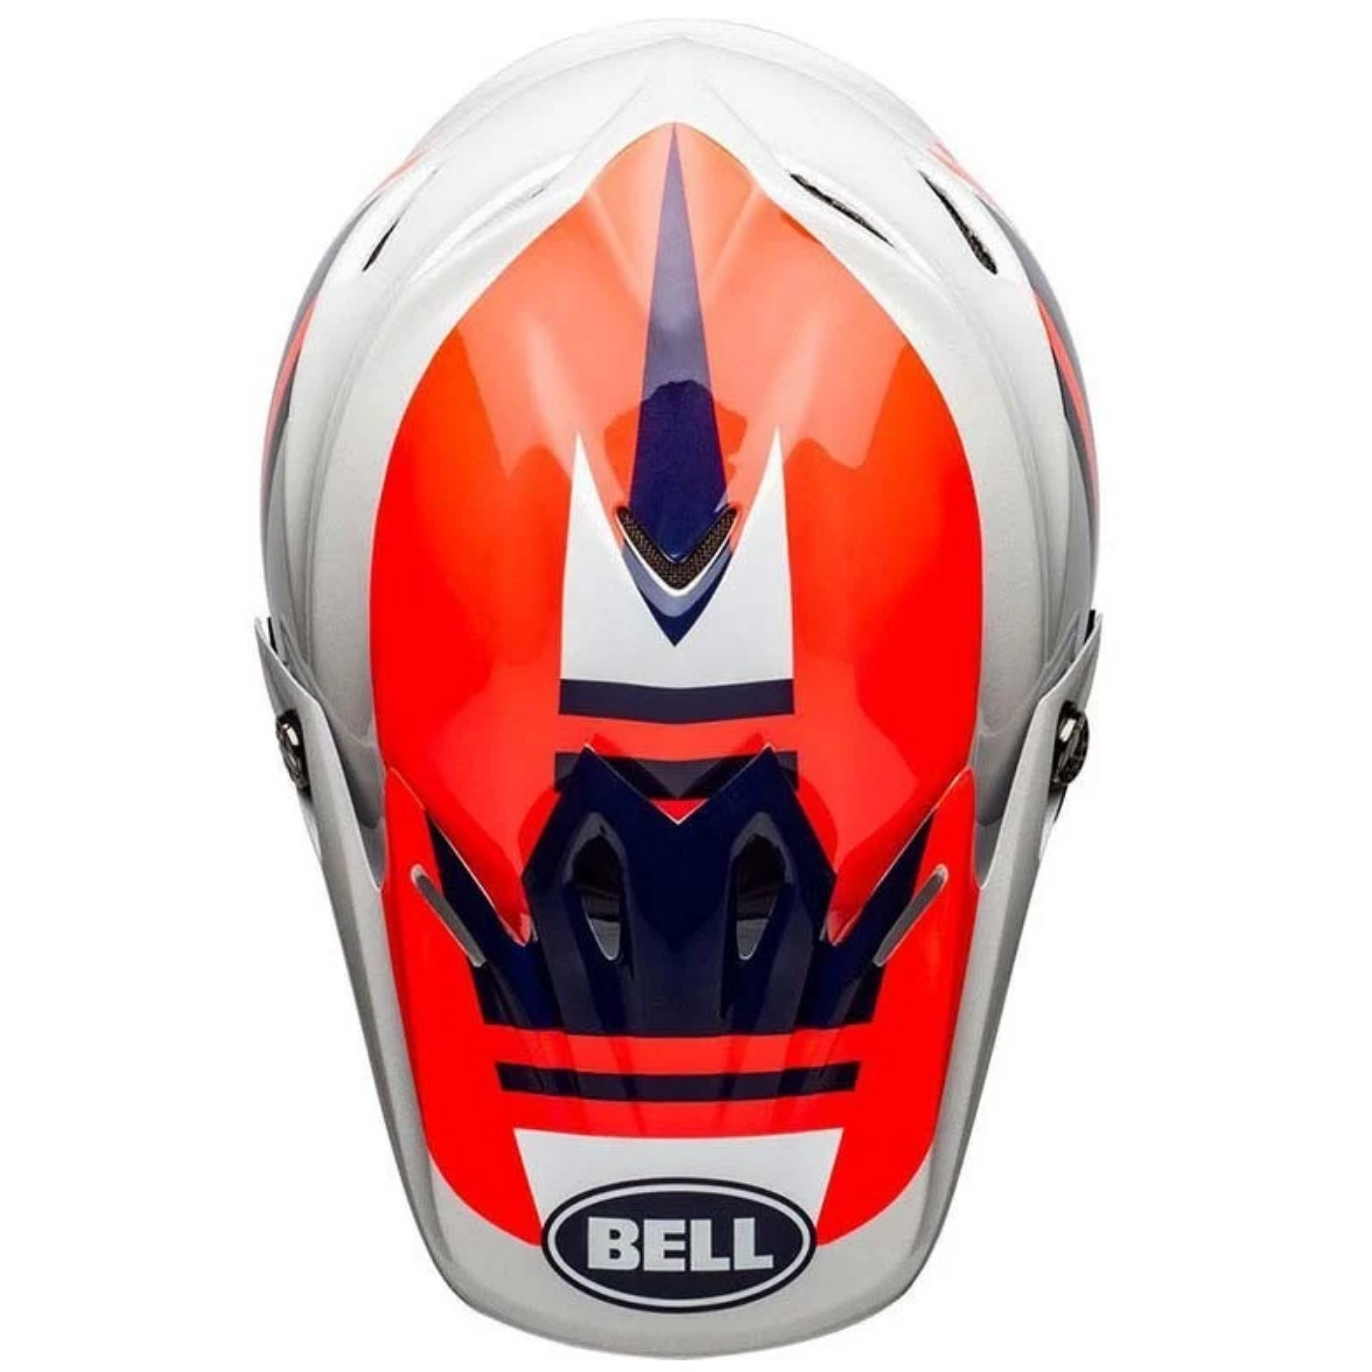 Casco Cross Bell Moto 9 Mips Prophecy Gloss Infrared Navy Gray 2